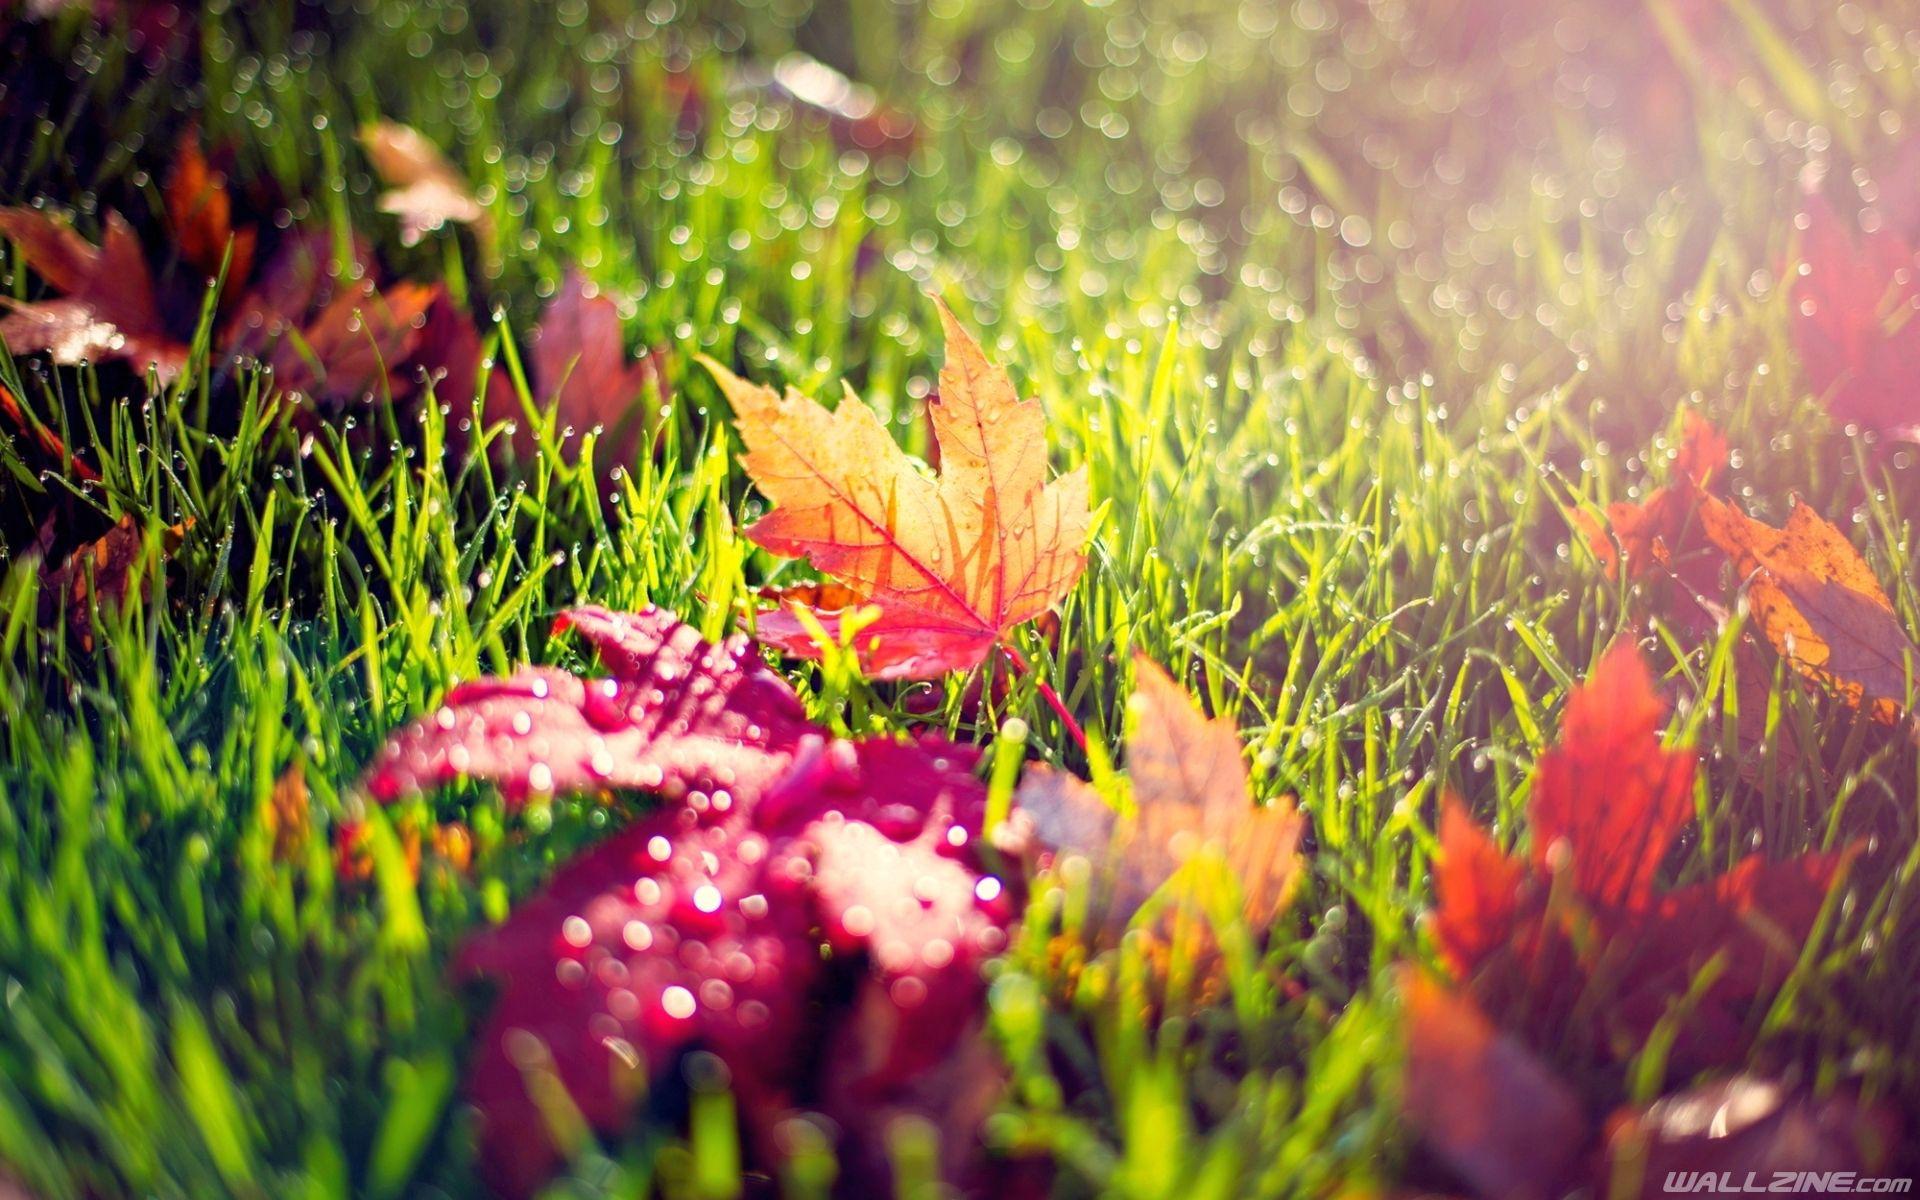 autumn leaves in morning dew wallpaper | hd desktop wallpapers